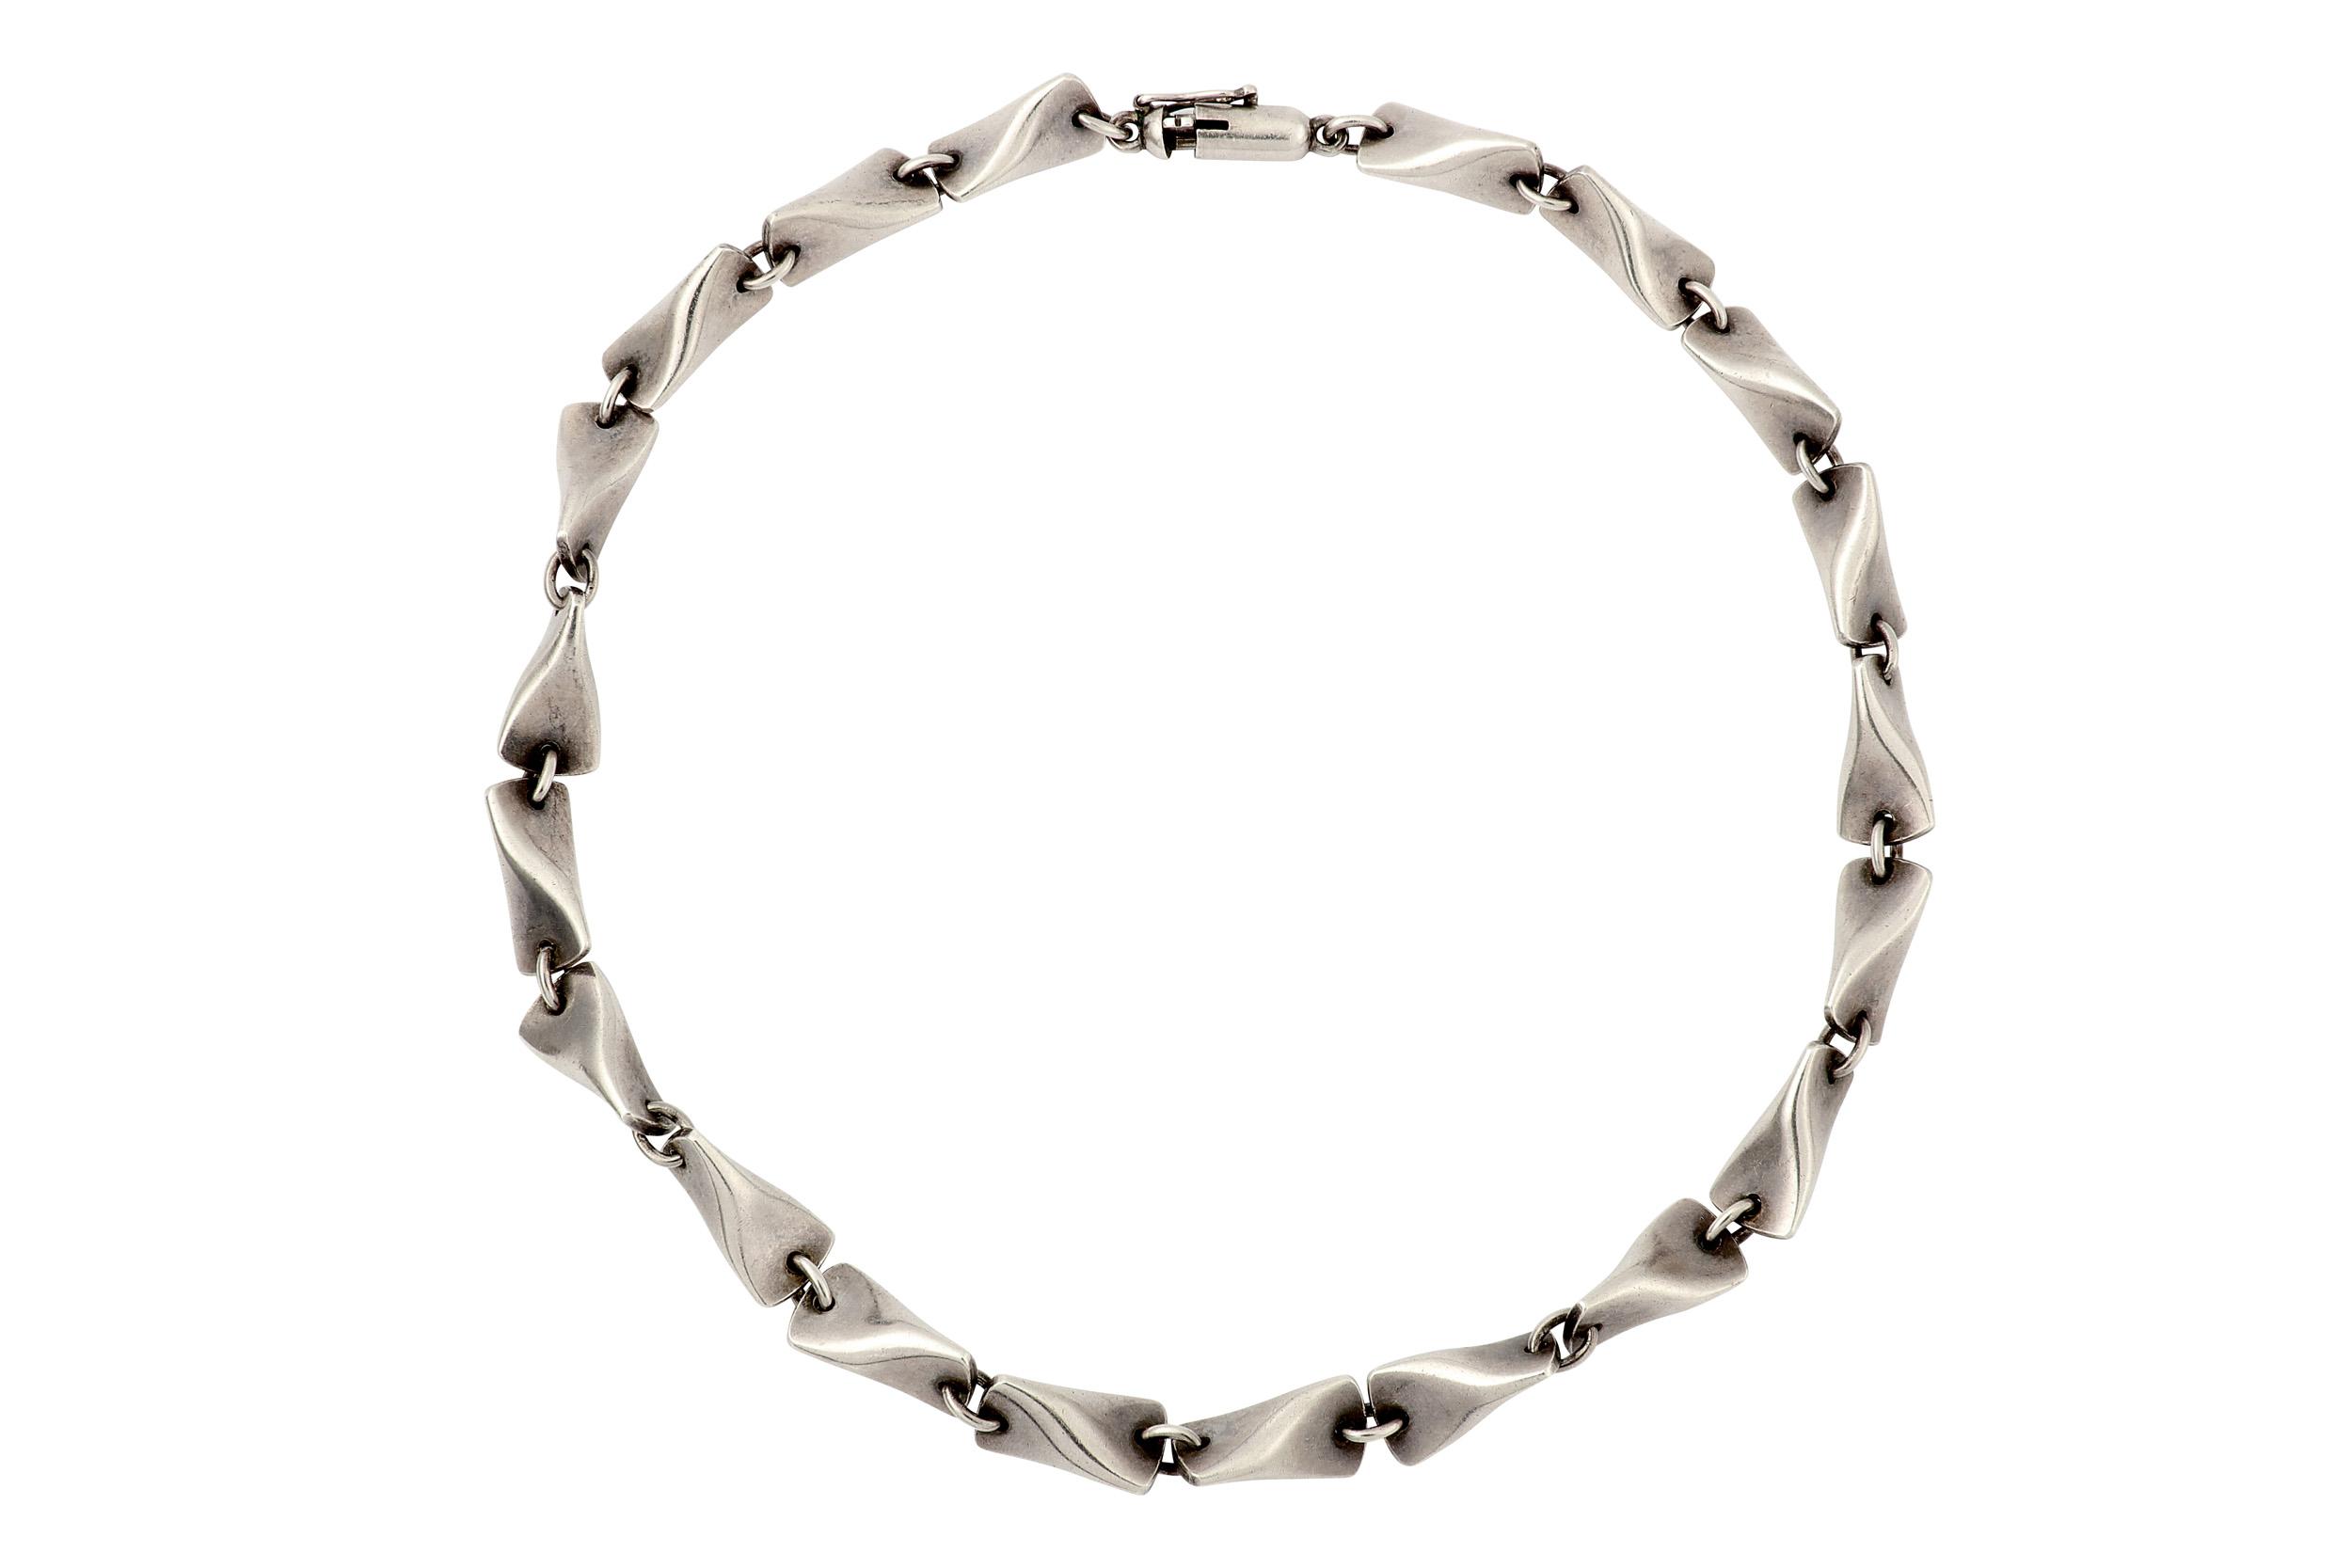 Lot 55 - A necklace and bracelet suite, by Kindt Larsen forGeorg Jensen, circa 1950